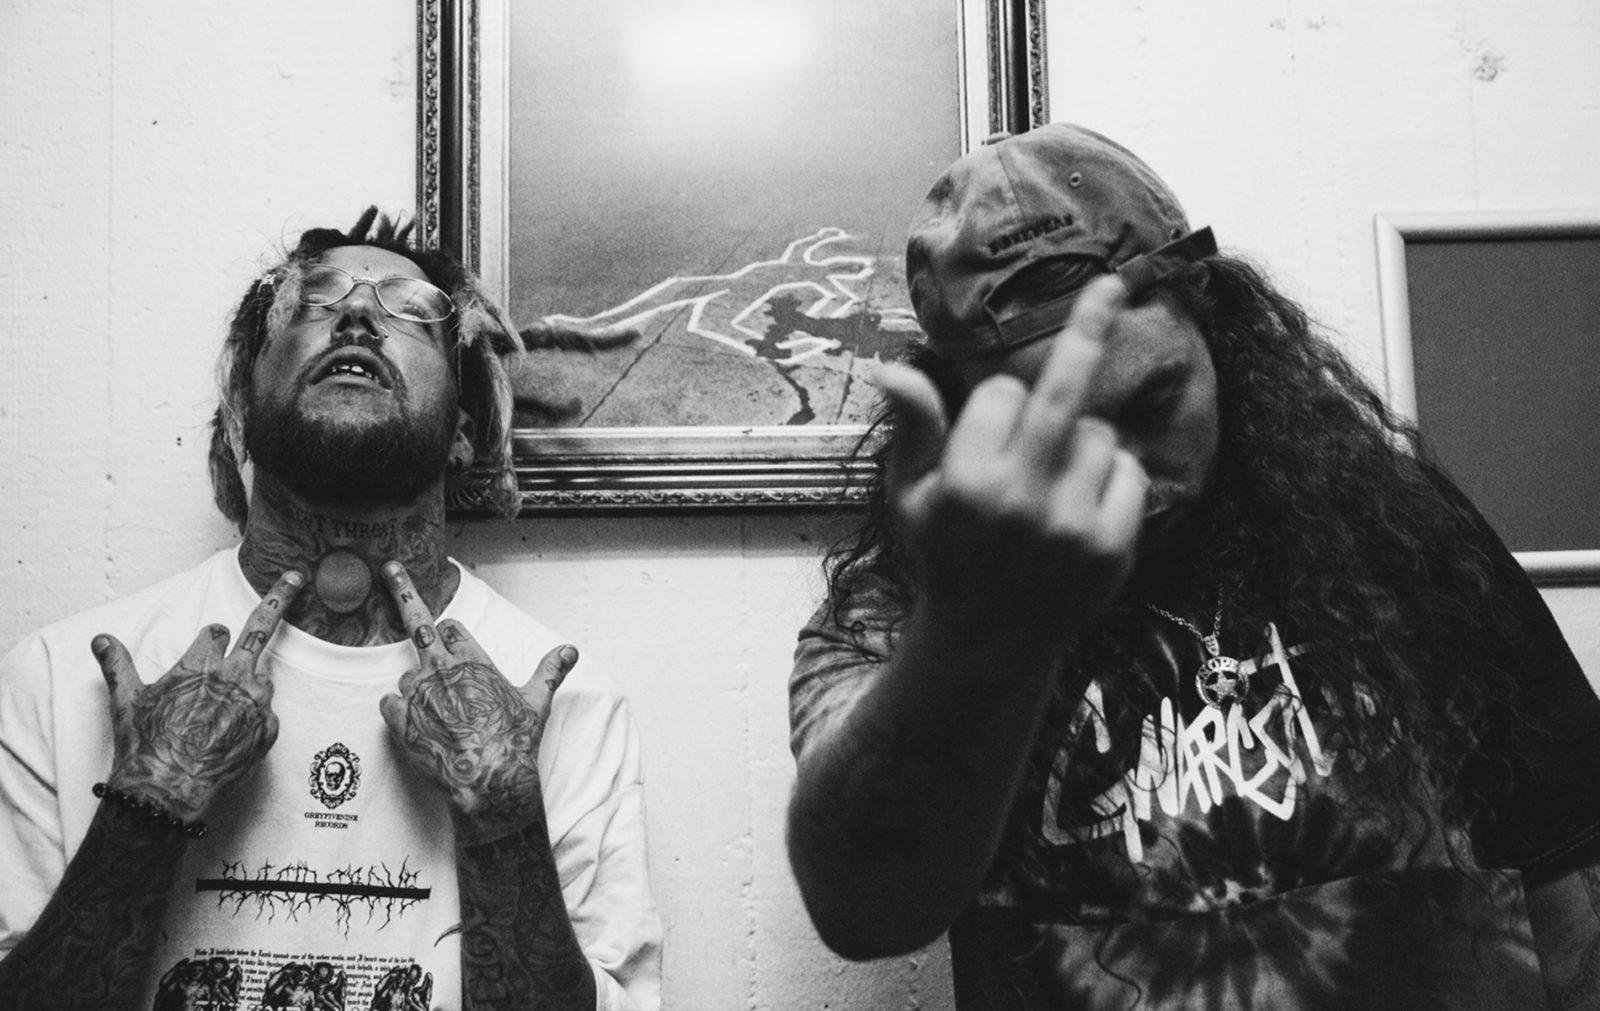 suicideboys - LOLLAPALOOZA, le dernier festival de la tournée RADAR